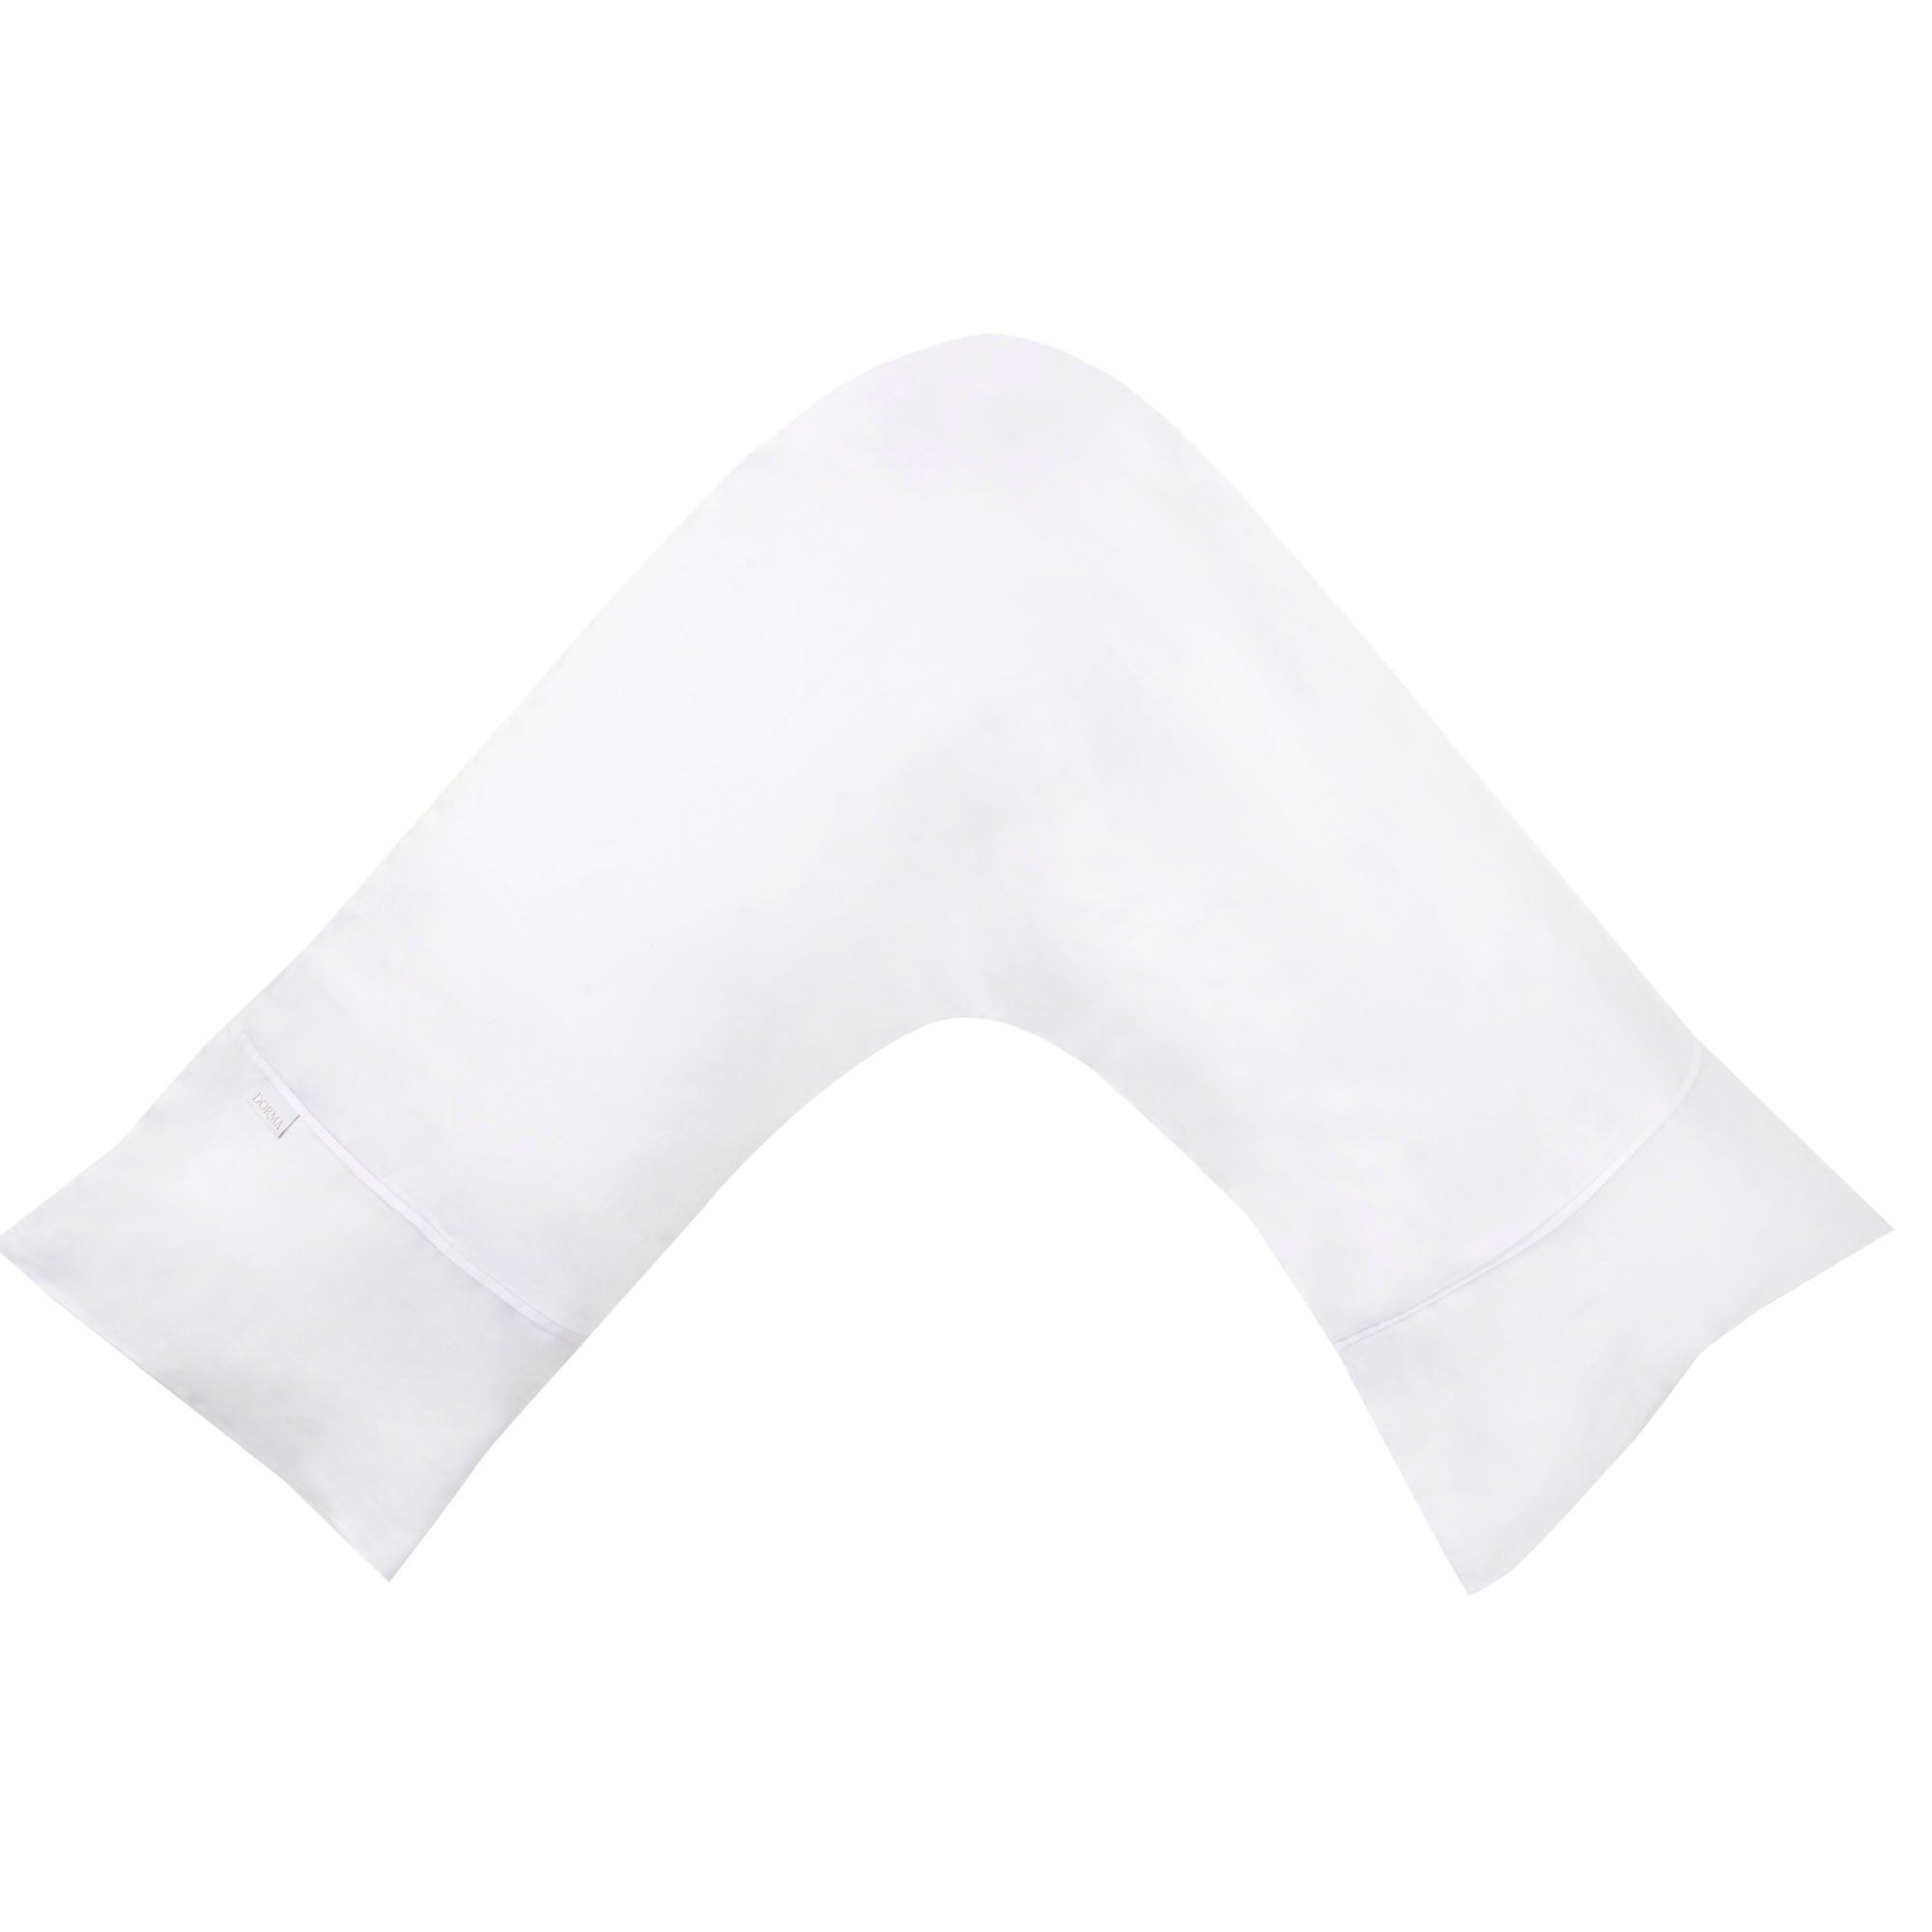 Dorma 350 Thread Count V Shaped Pillowcase